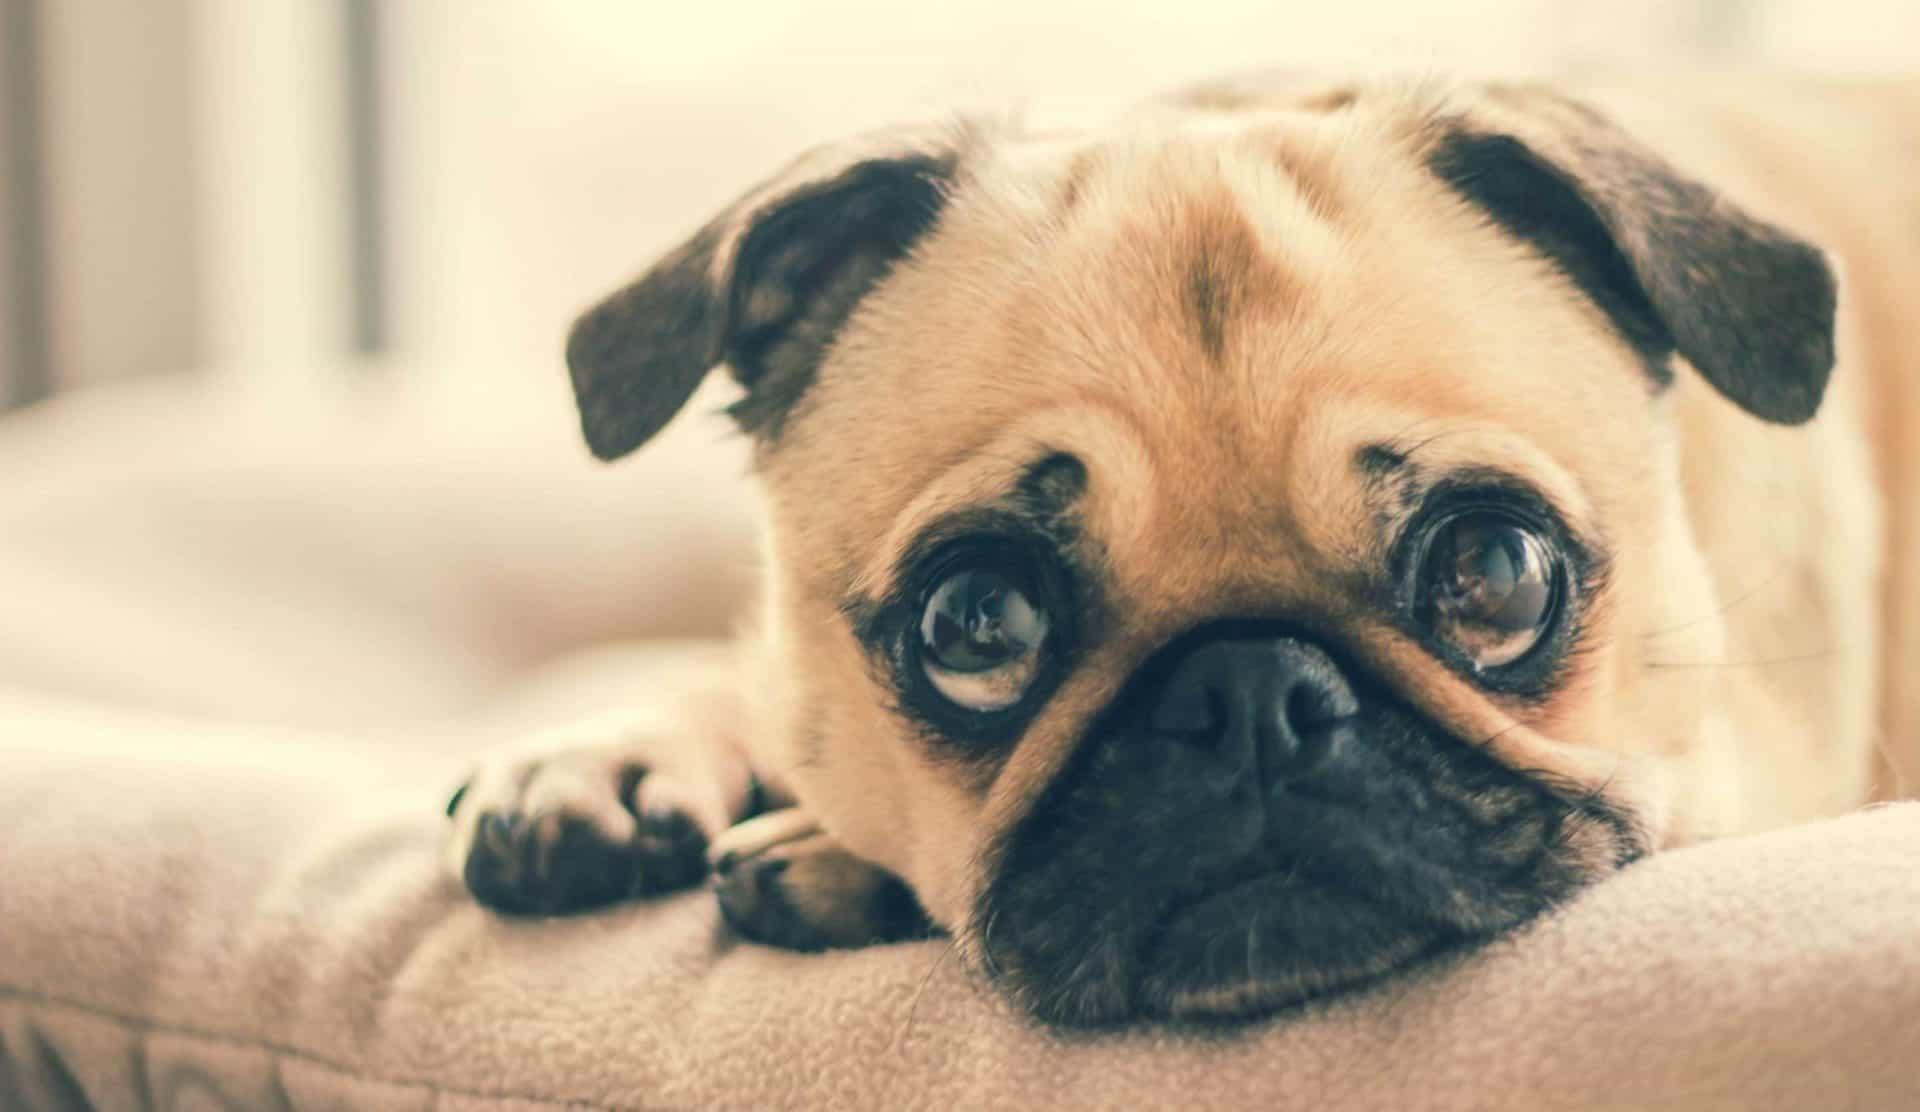 How to Calm a Nervous Dog